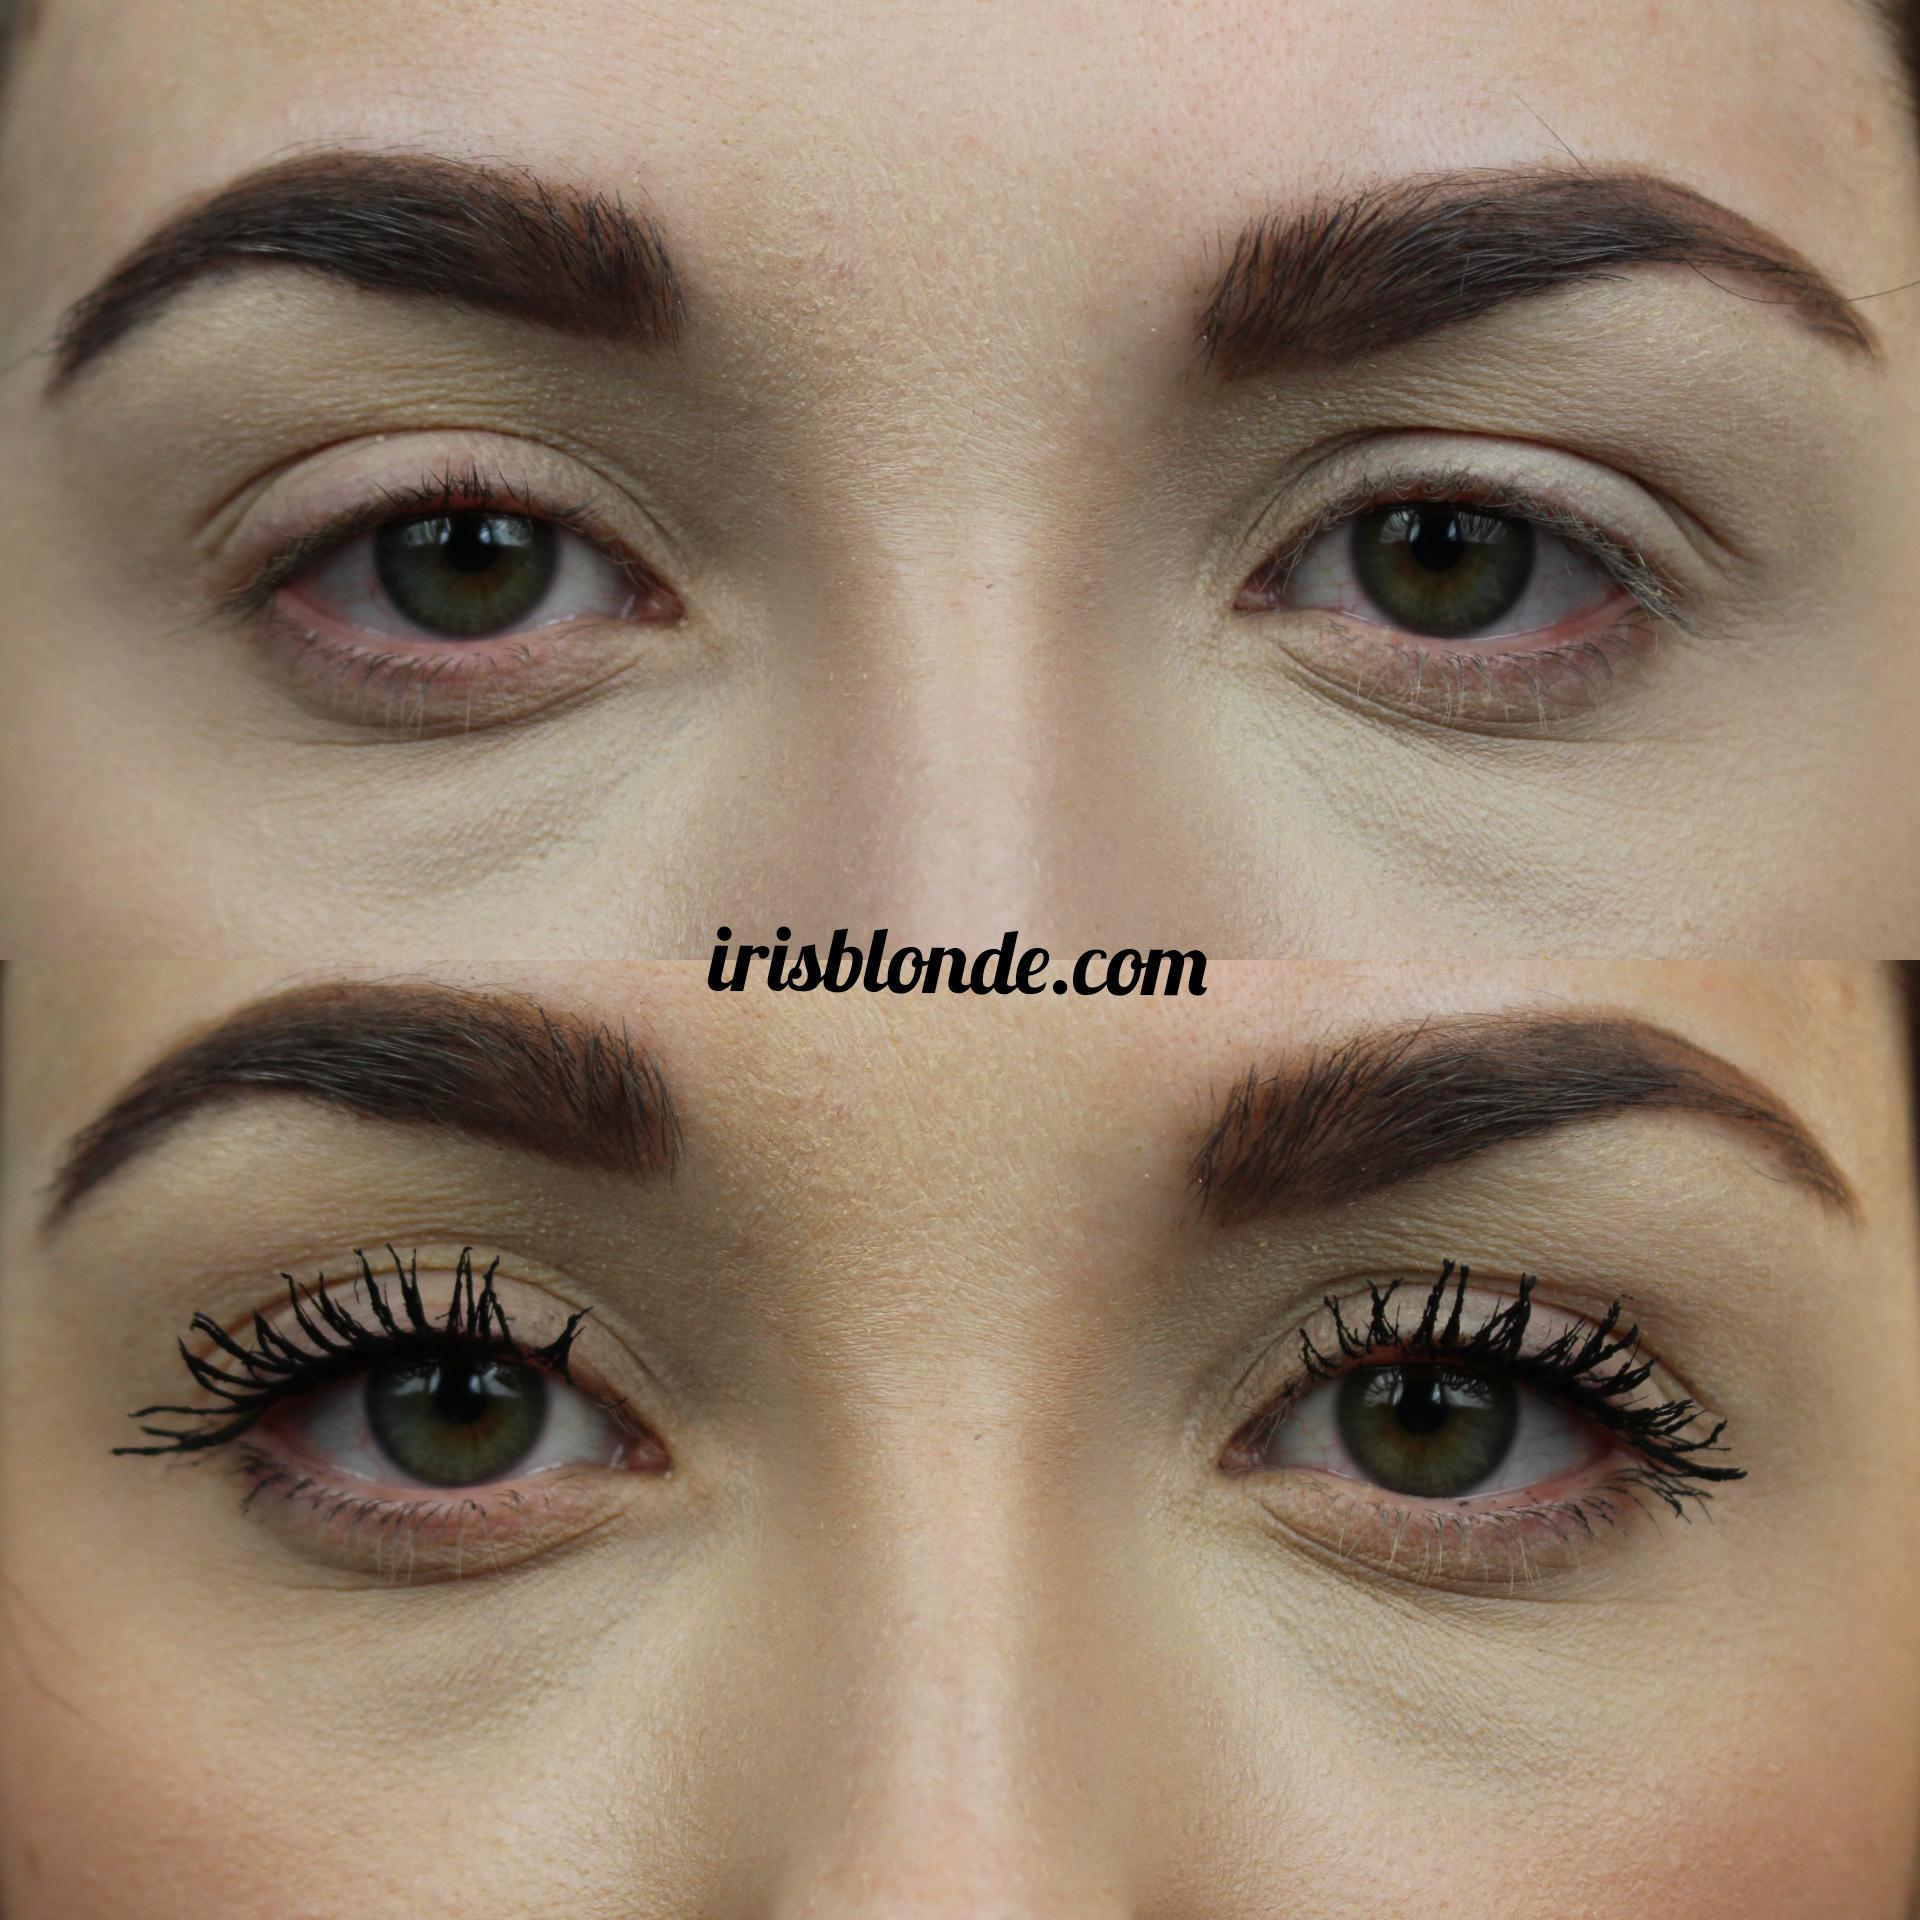 Prima e dopo mascara essence